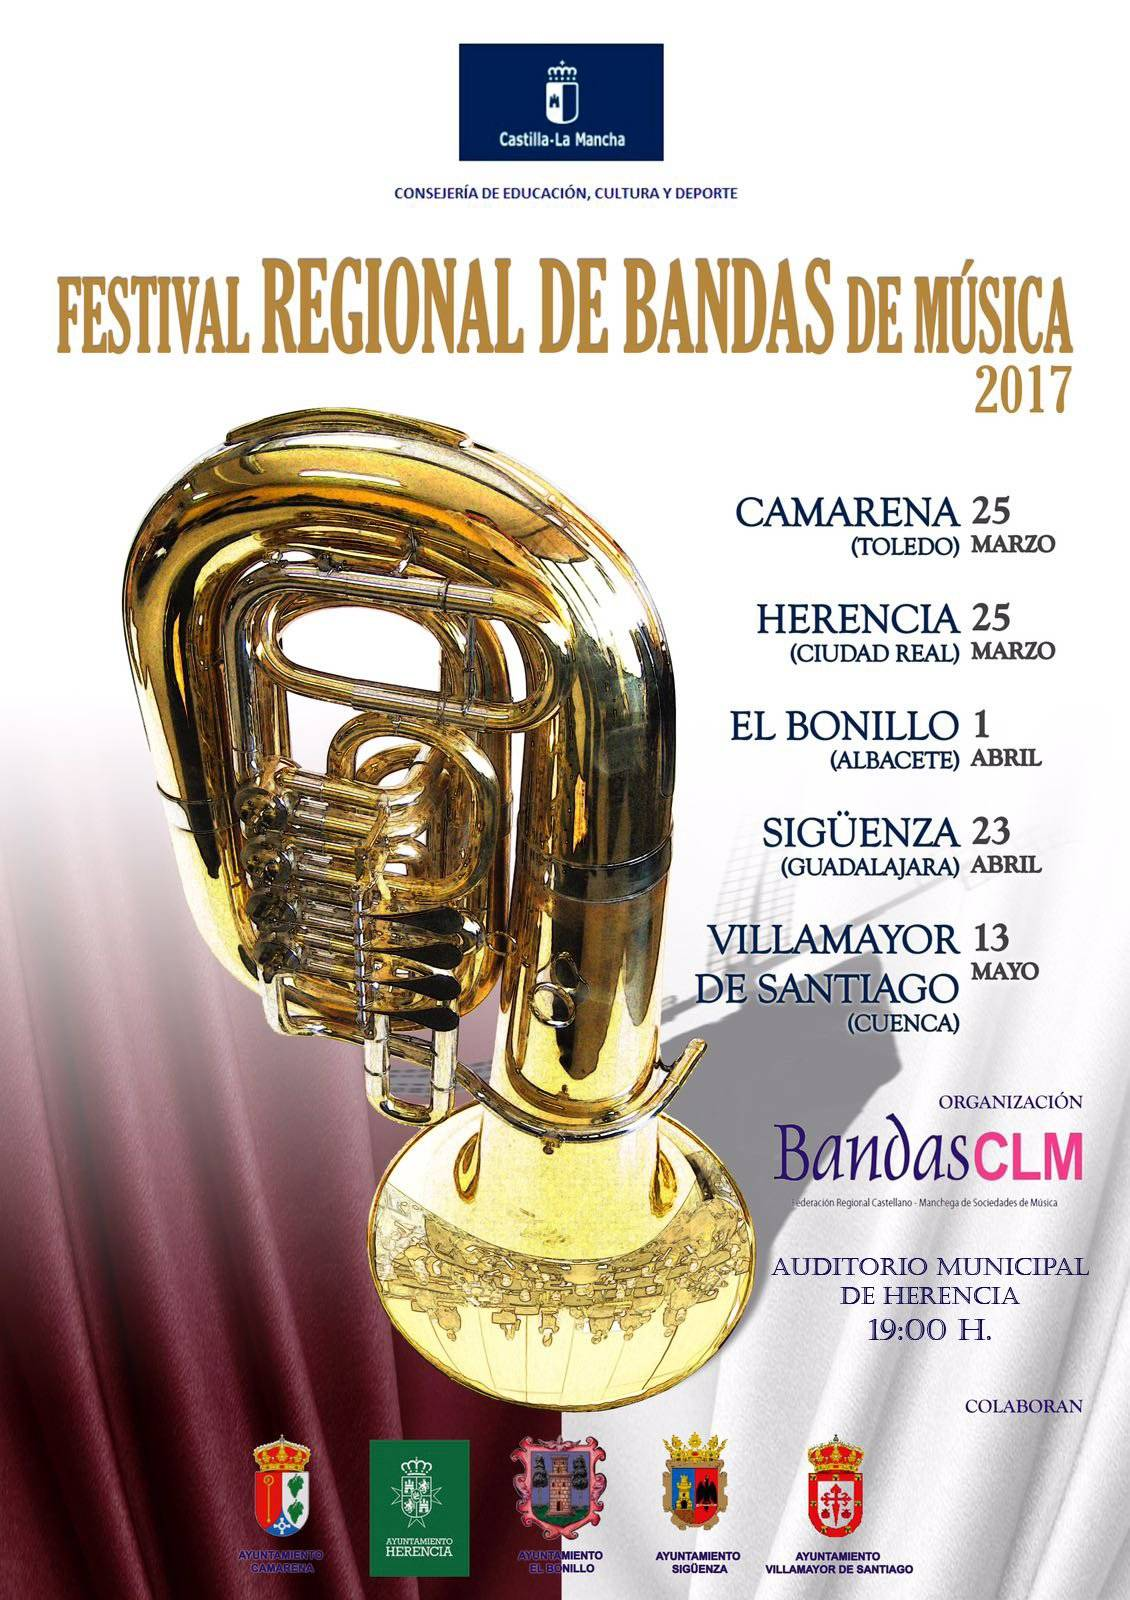 Festival Regional de Bandas de Música en Herencia 2017 1